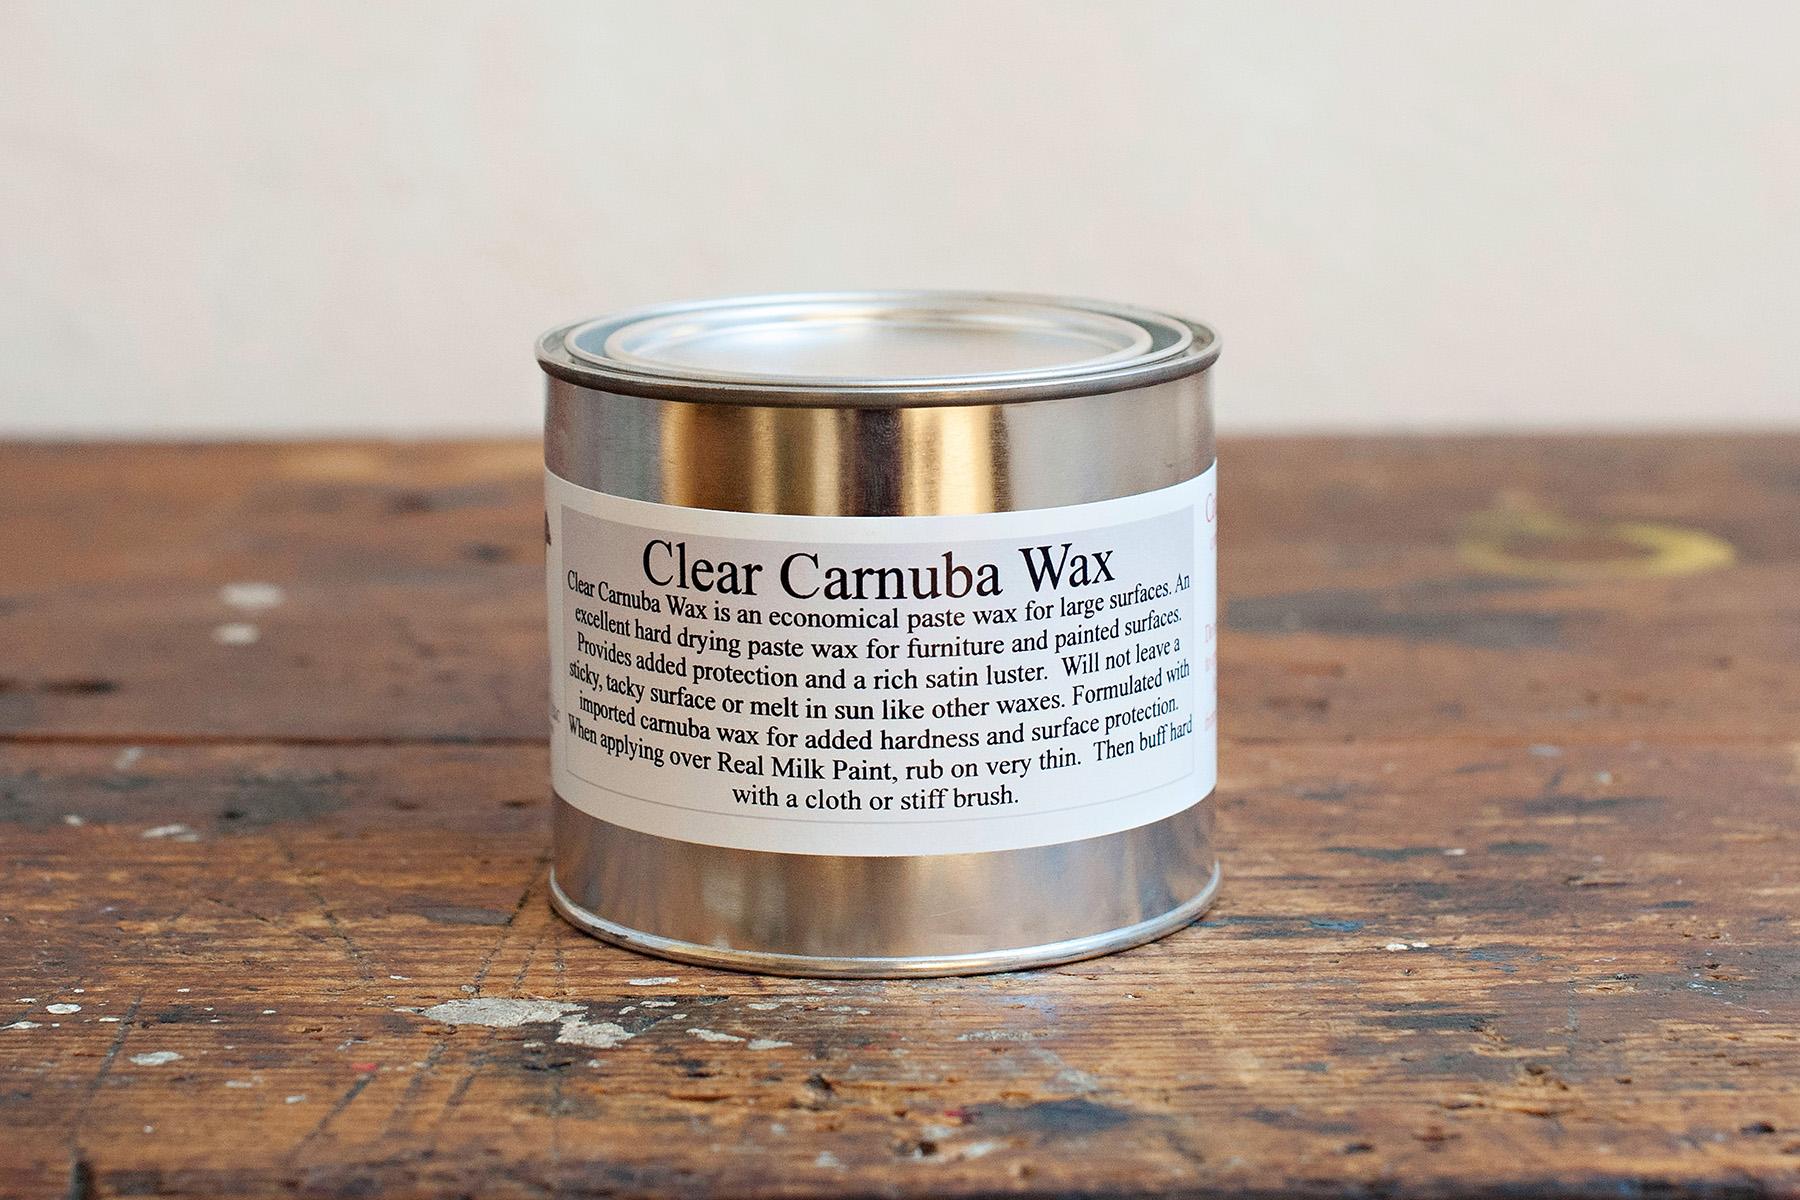 Clear Carnauba Wax - Easy to Use